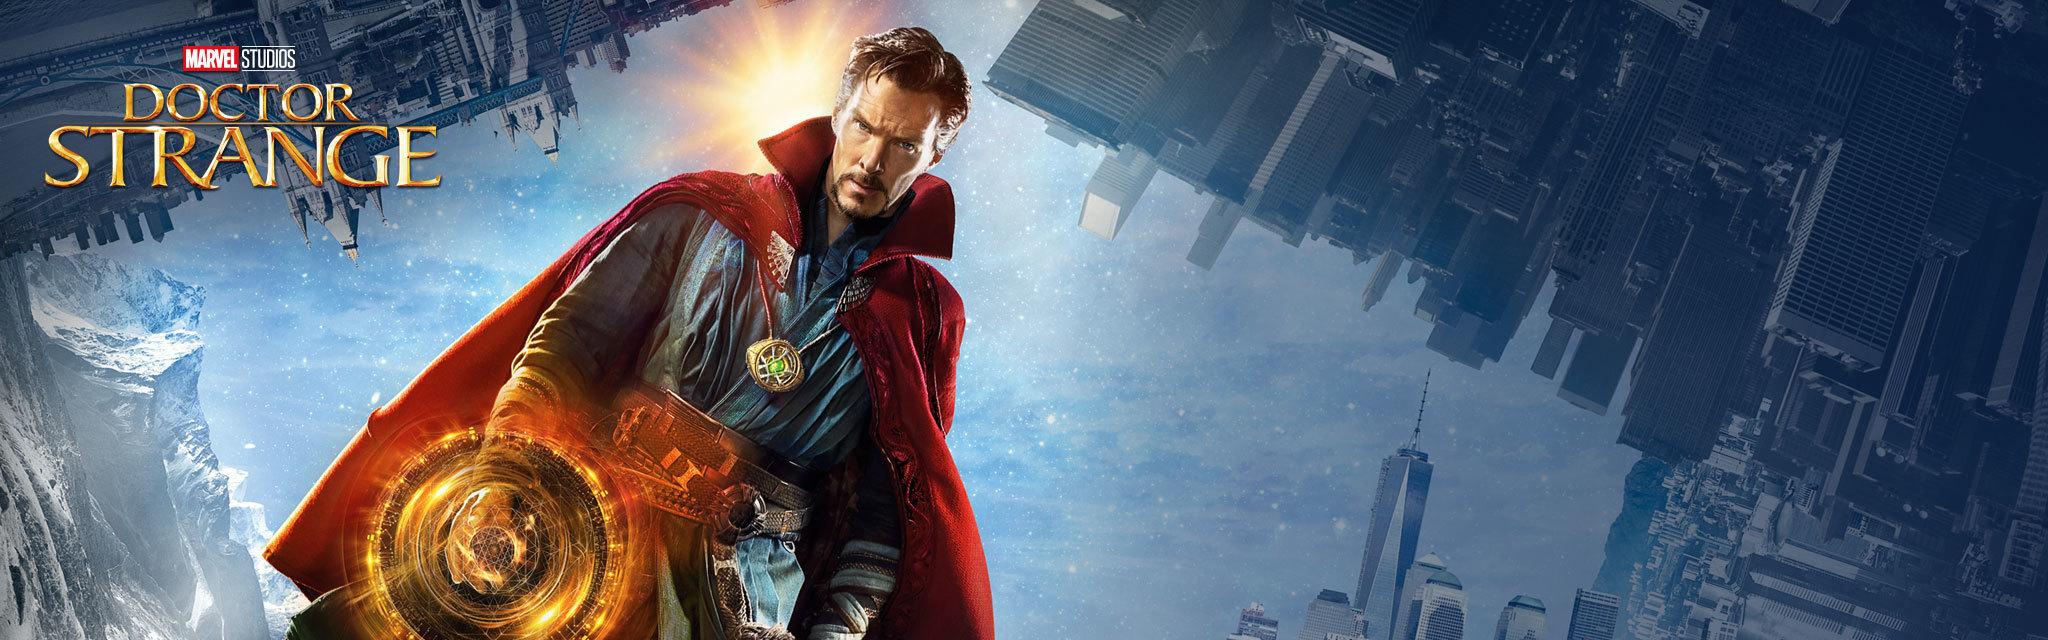 Doctor Strange In Cinemas Hero - ID